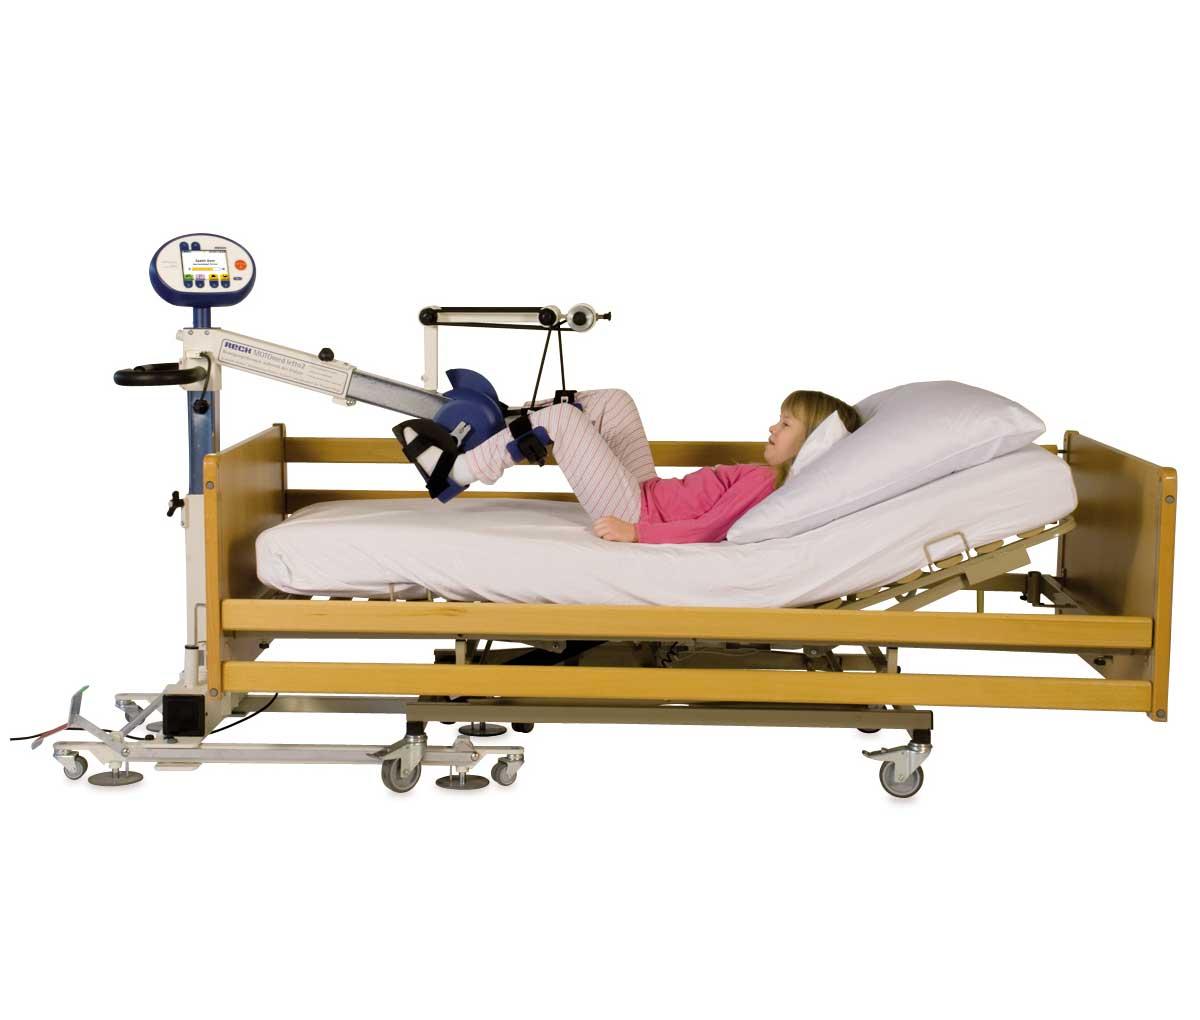 MOTOmed letto2 для дітей